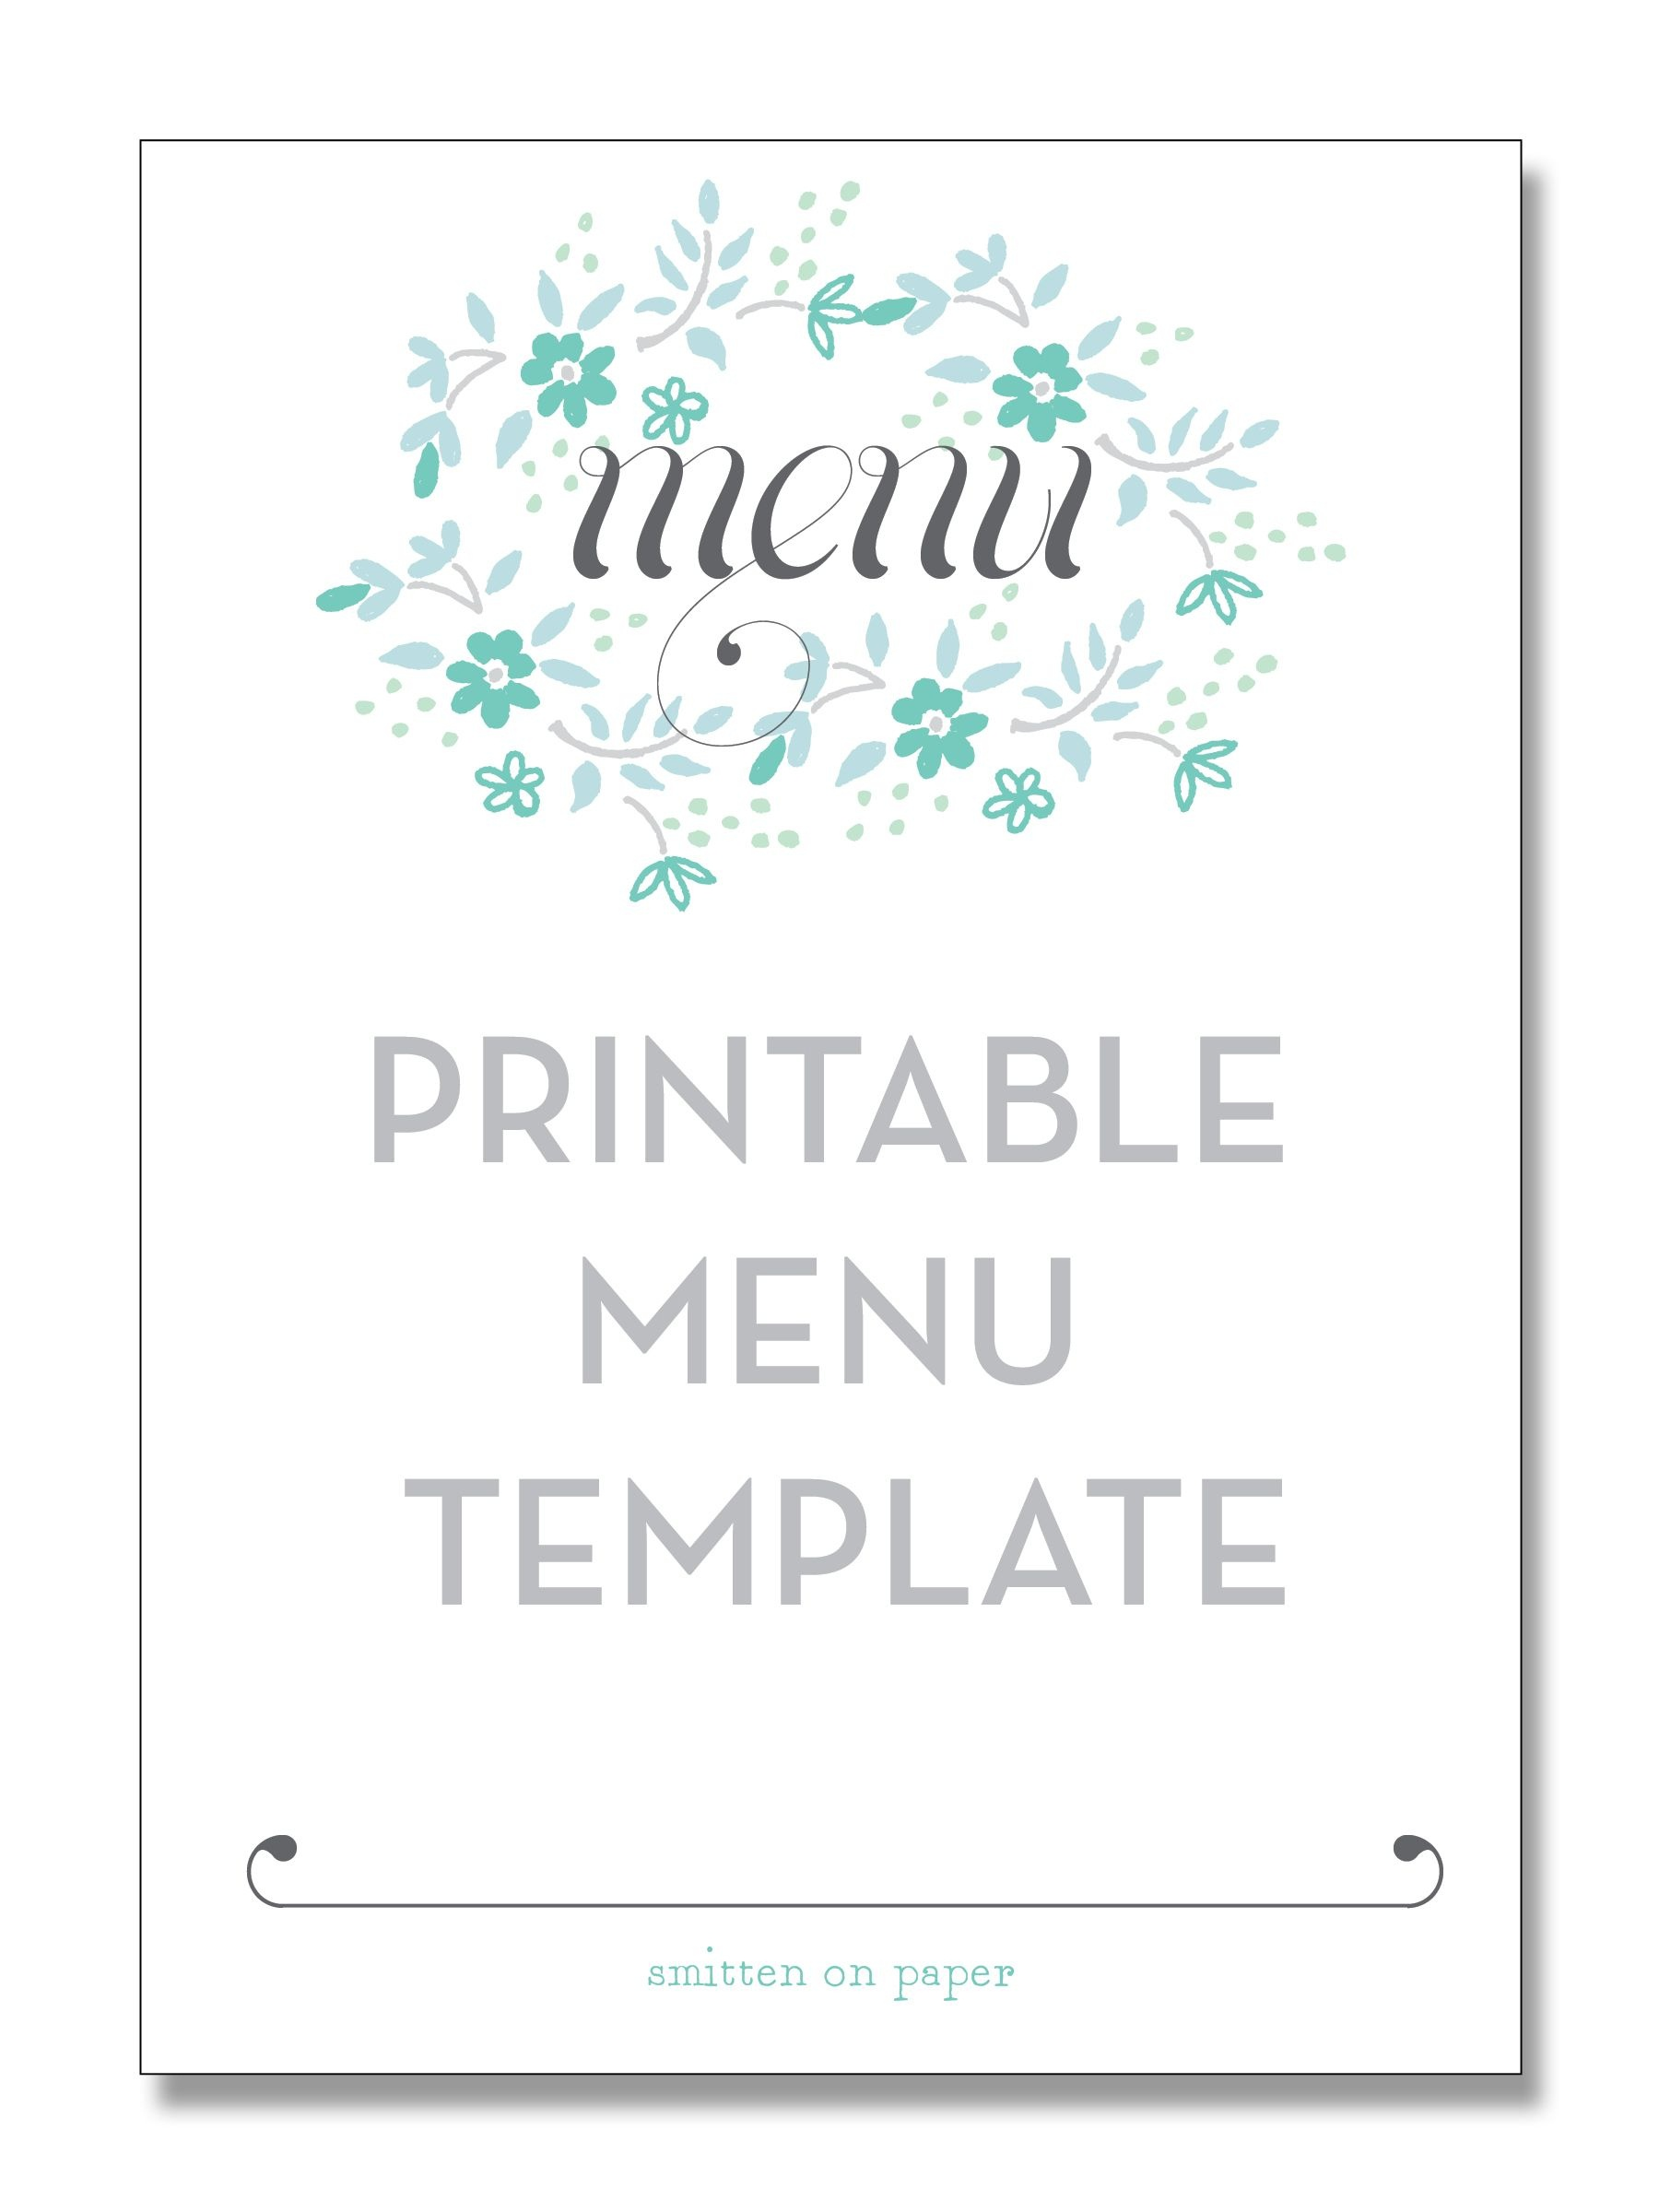 Free Printable Menu Template | Room Surf - Free Printable Restaurant Menu Templates